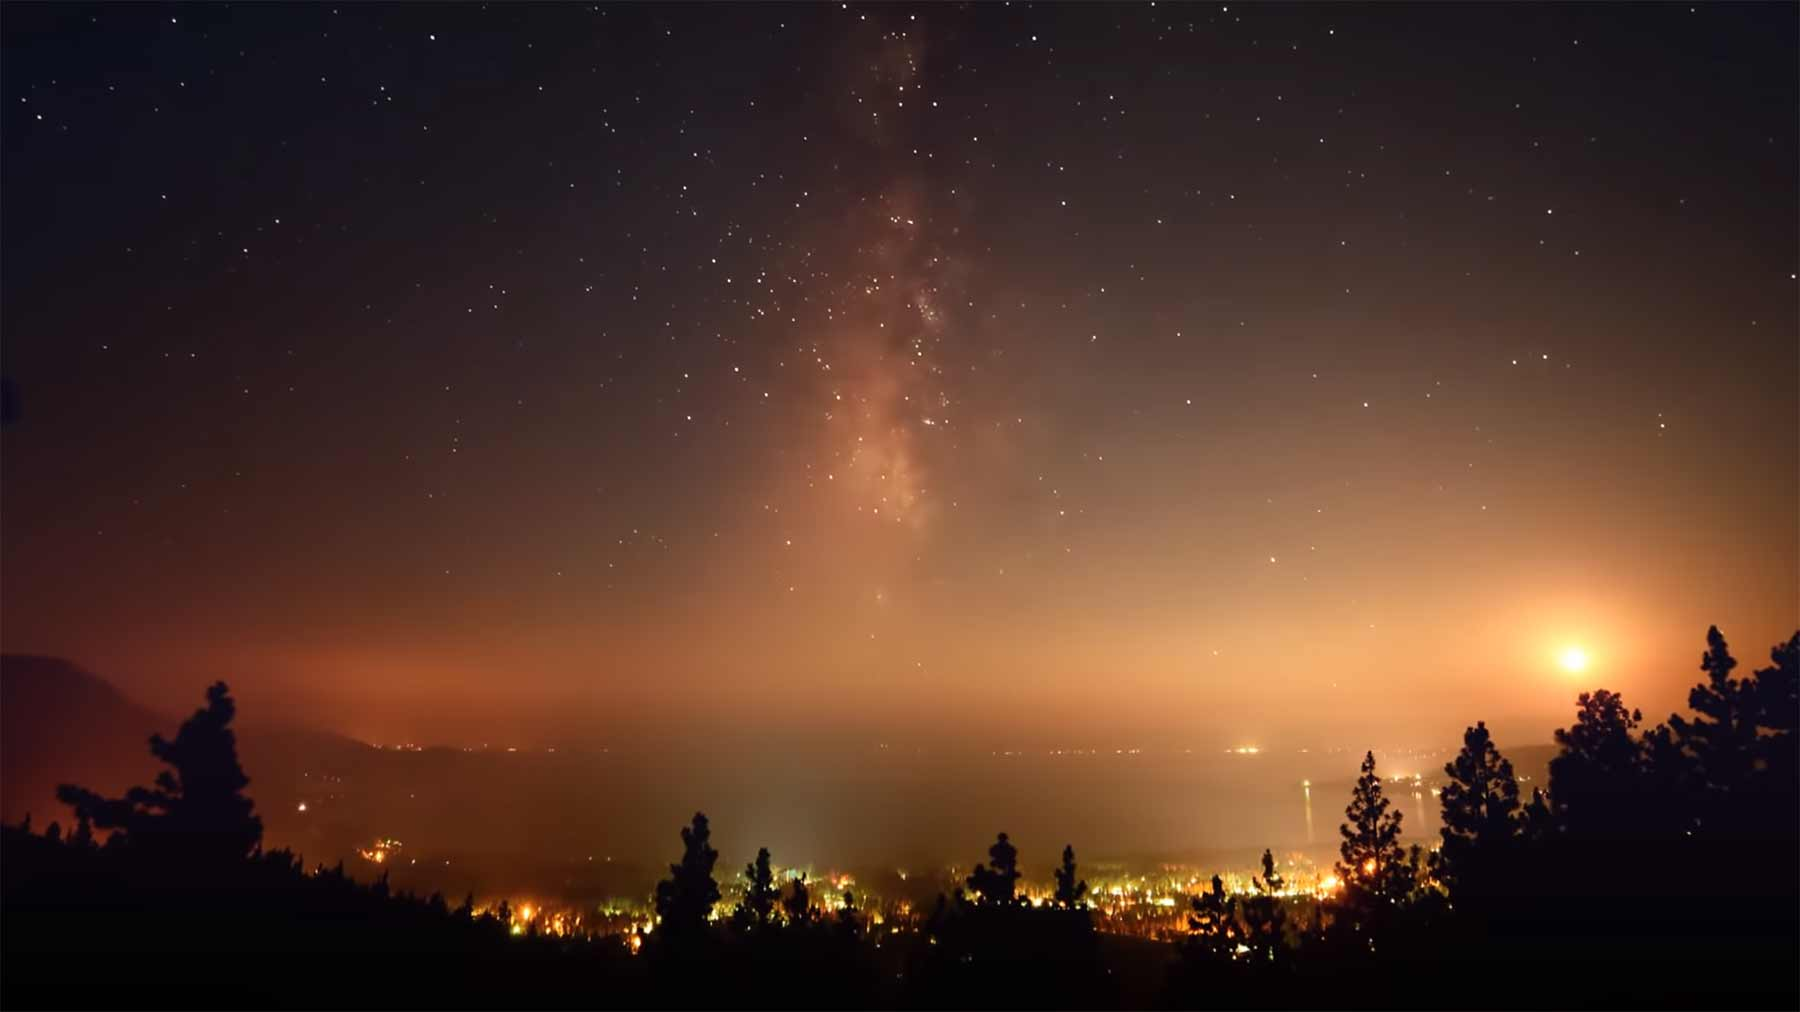 Timelapse: Moon, Milky Way, Meteors and Smoke over Lake Tahoe